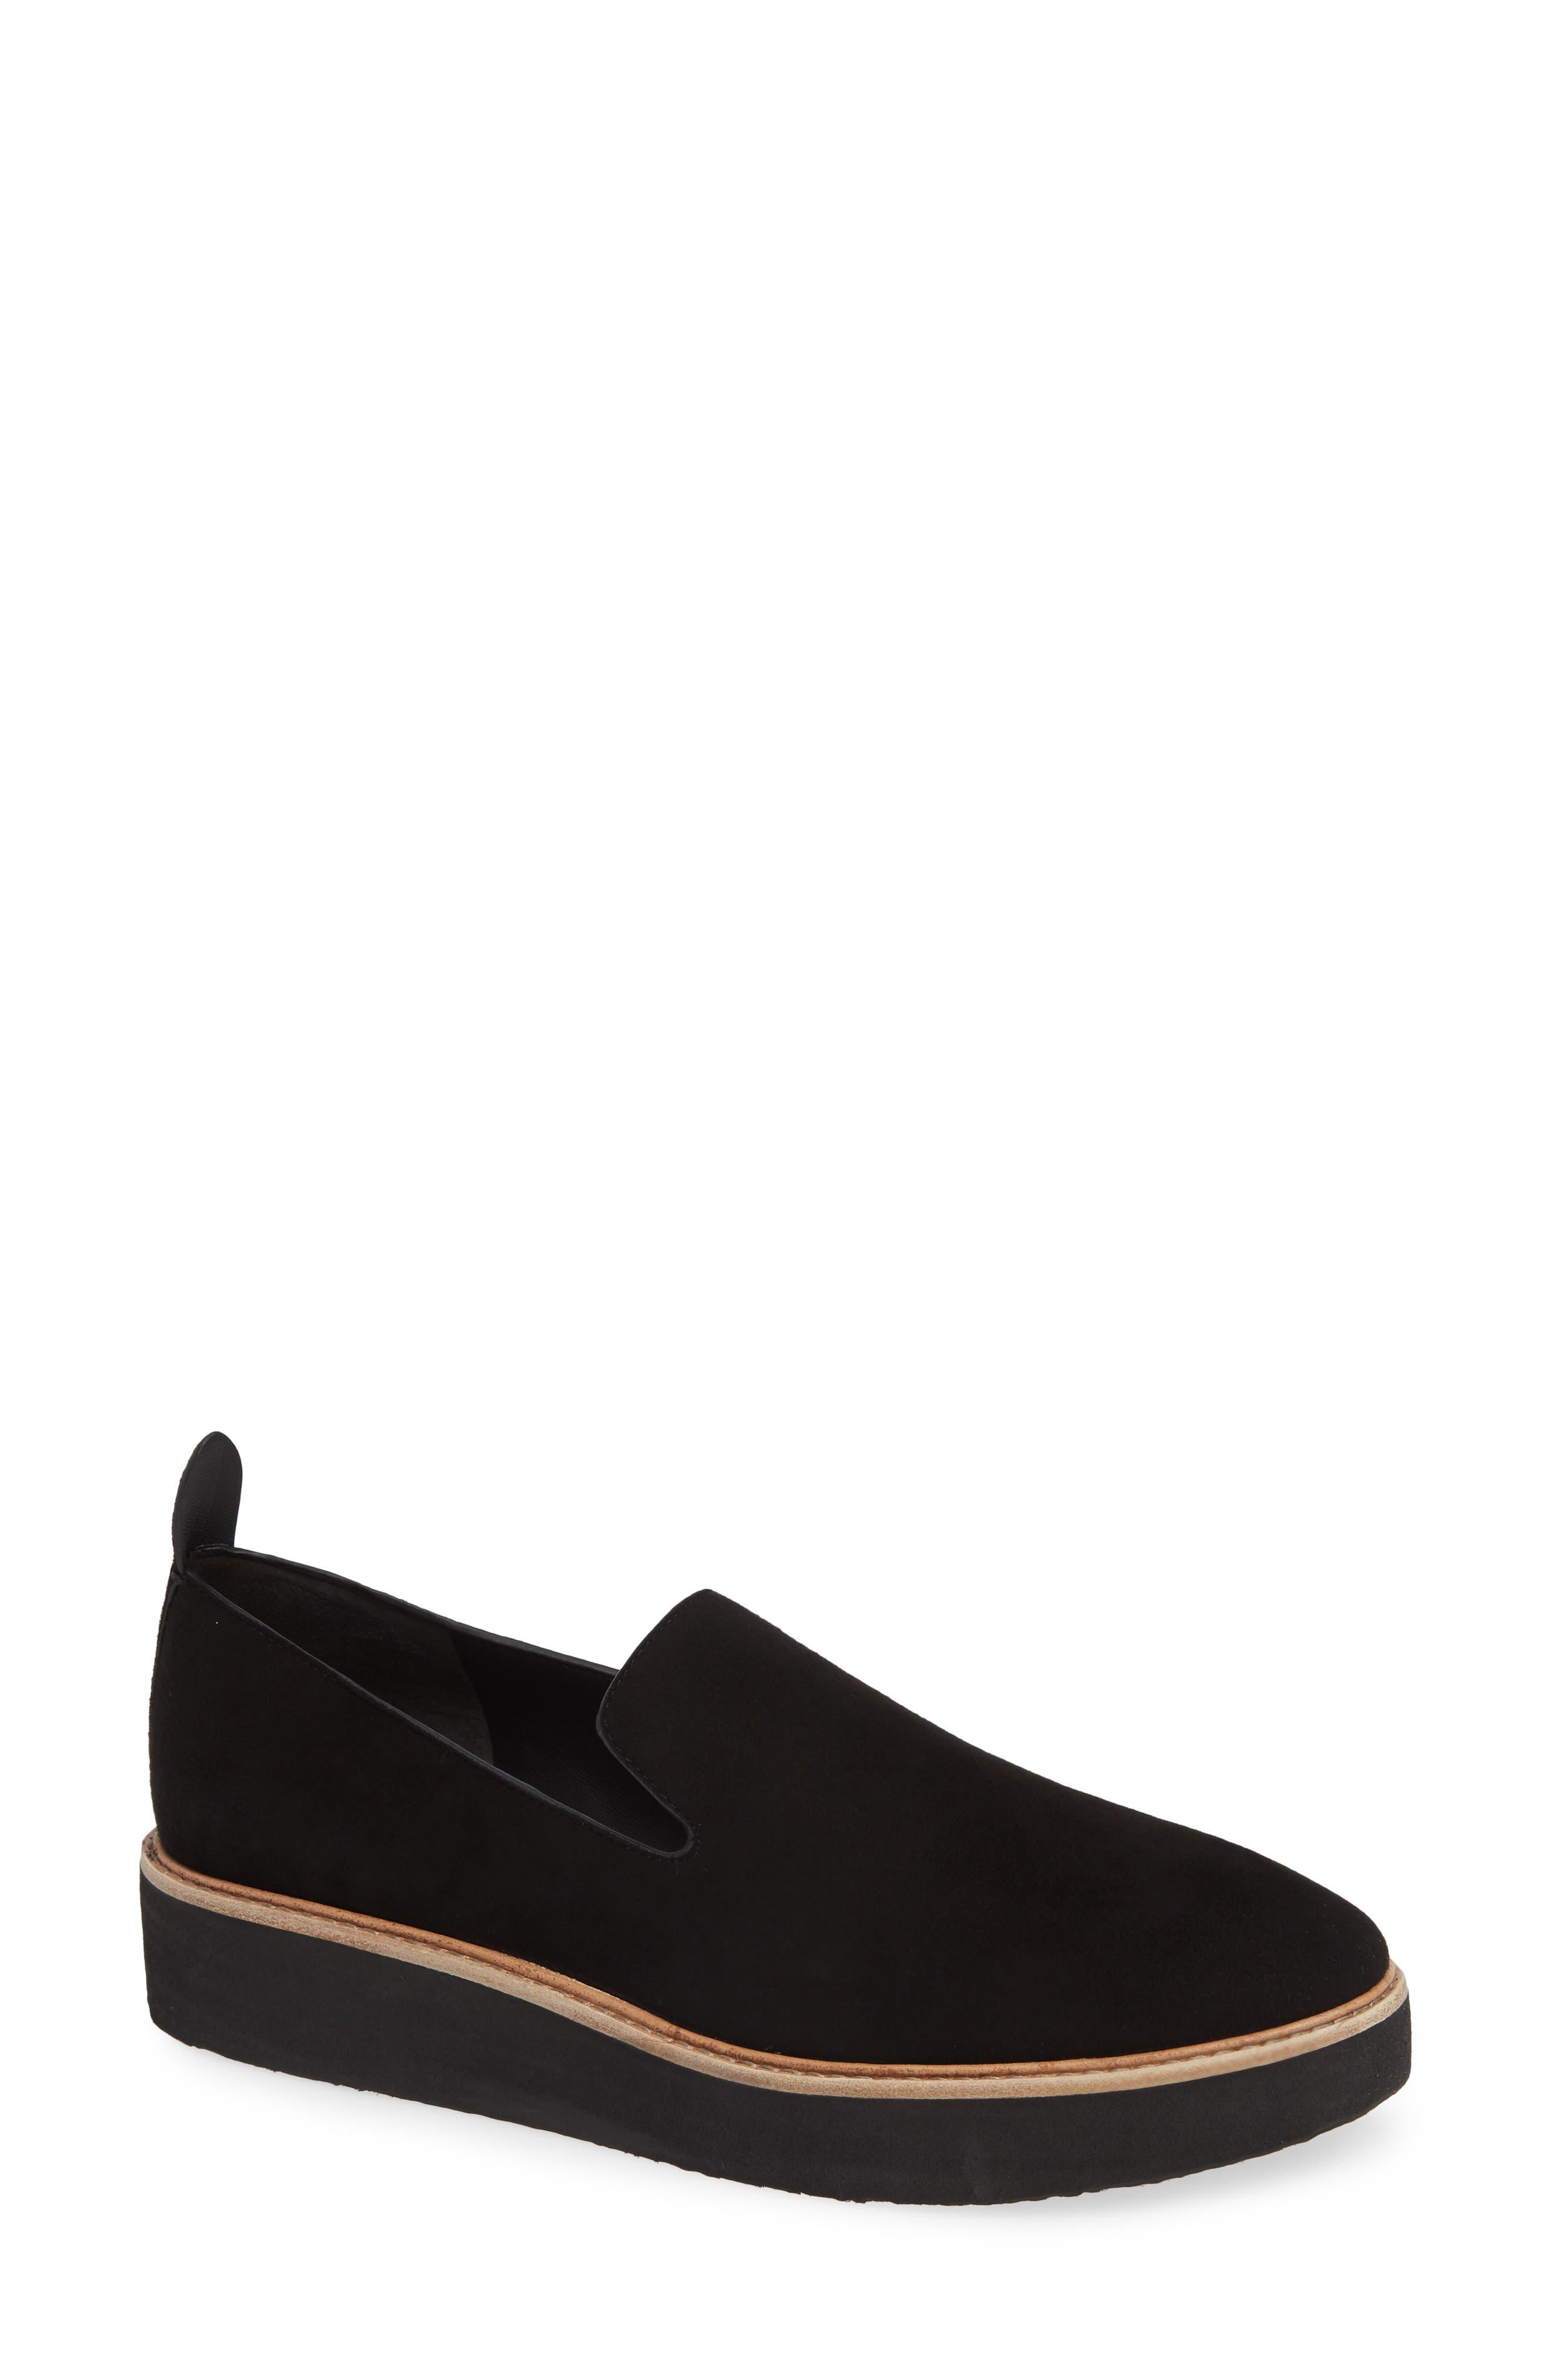 Sanders Slip-On Sneaker,                         Main,                         color, BLACK/ BLACK LEATHER